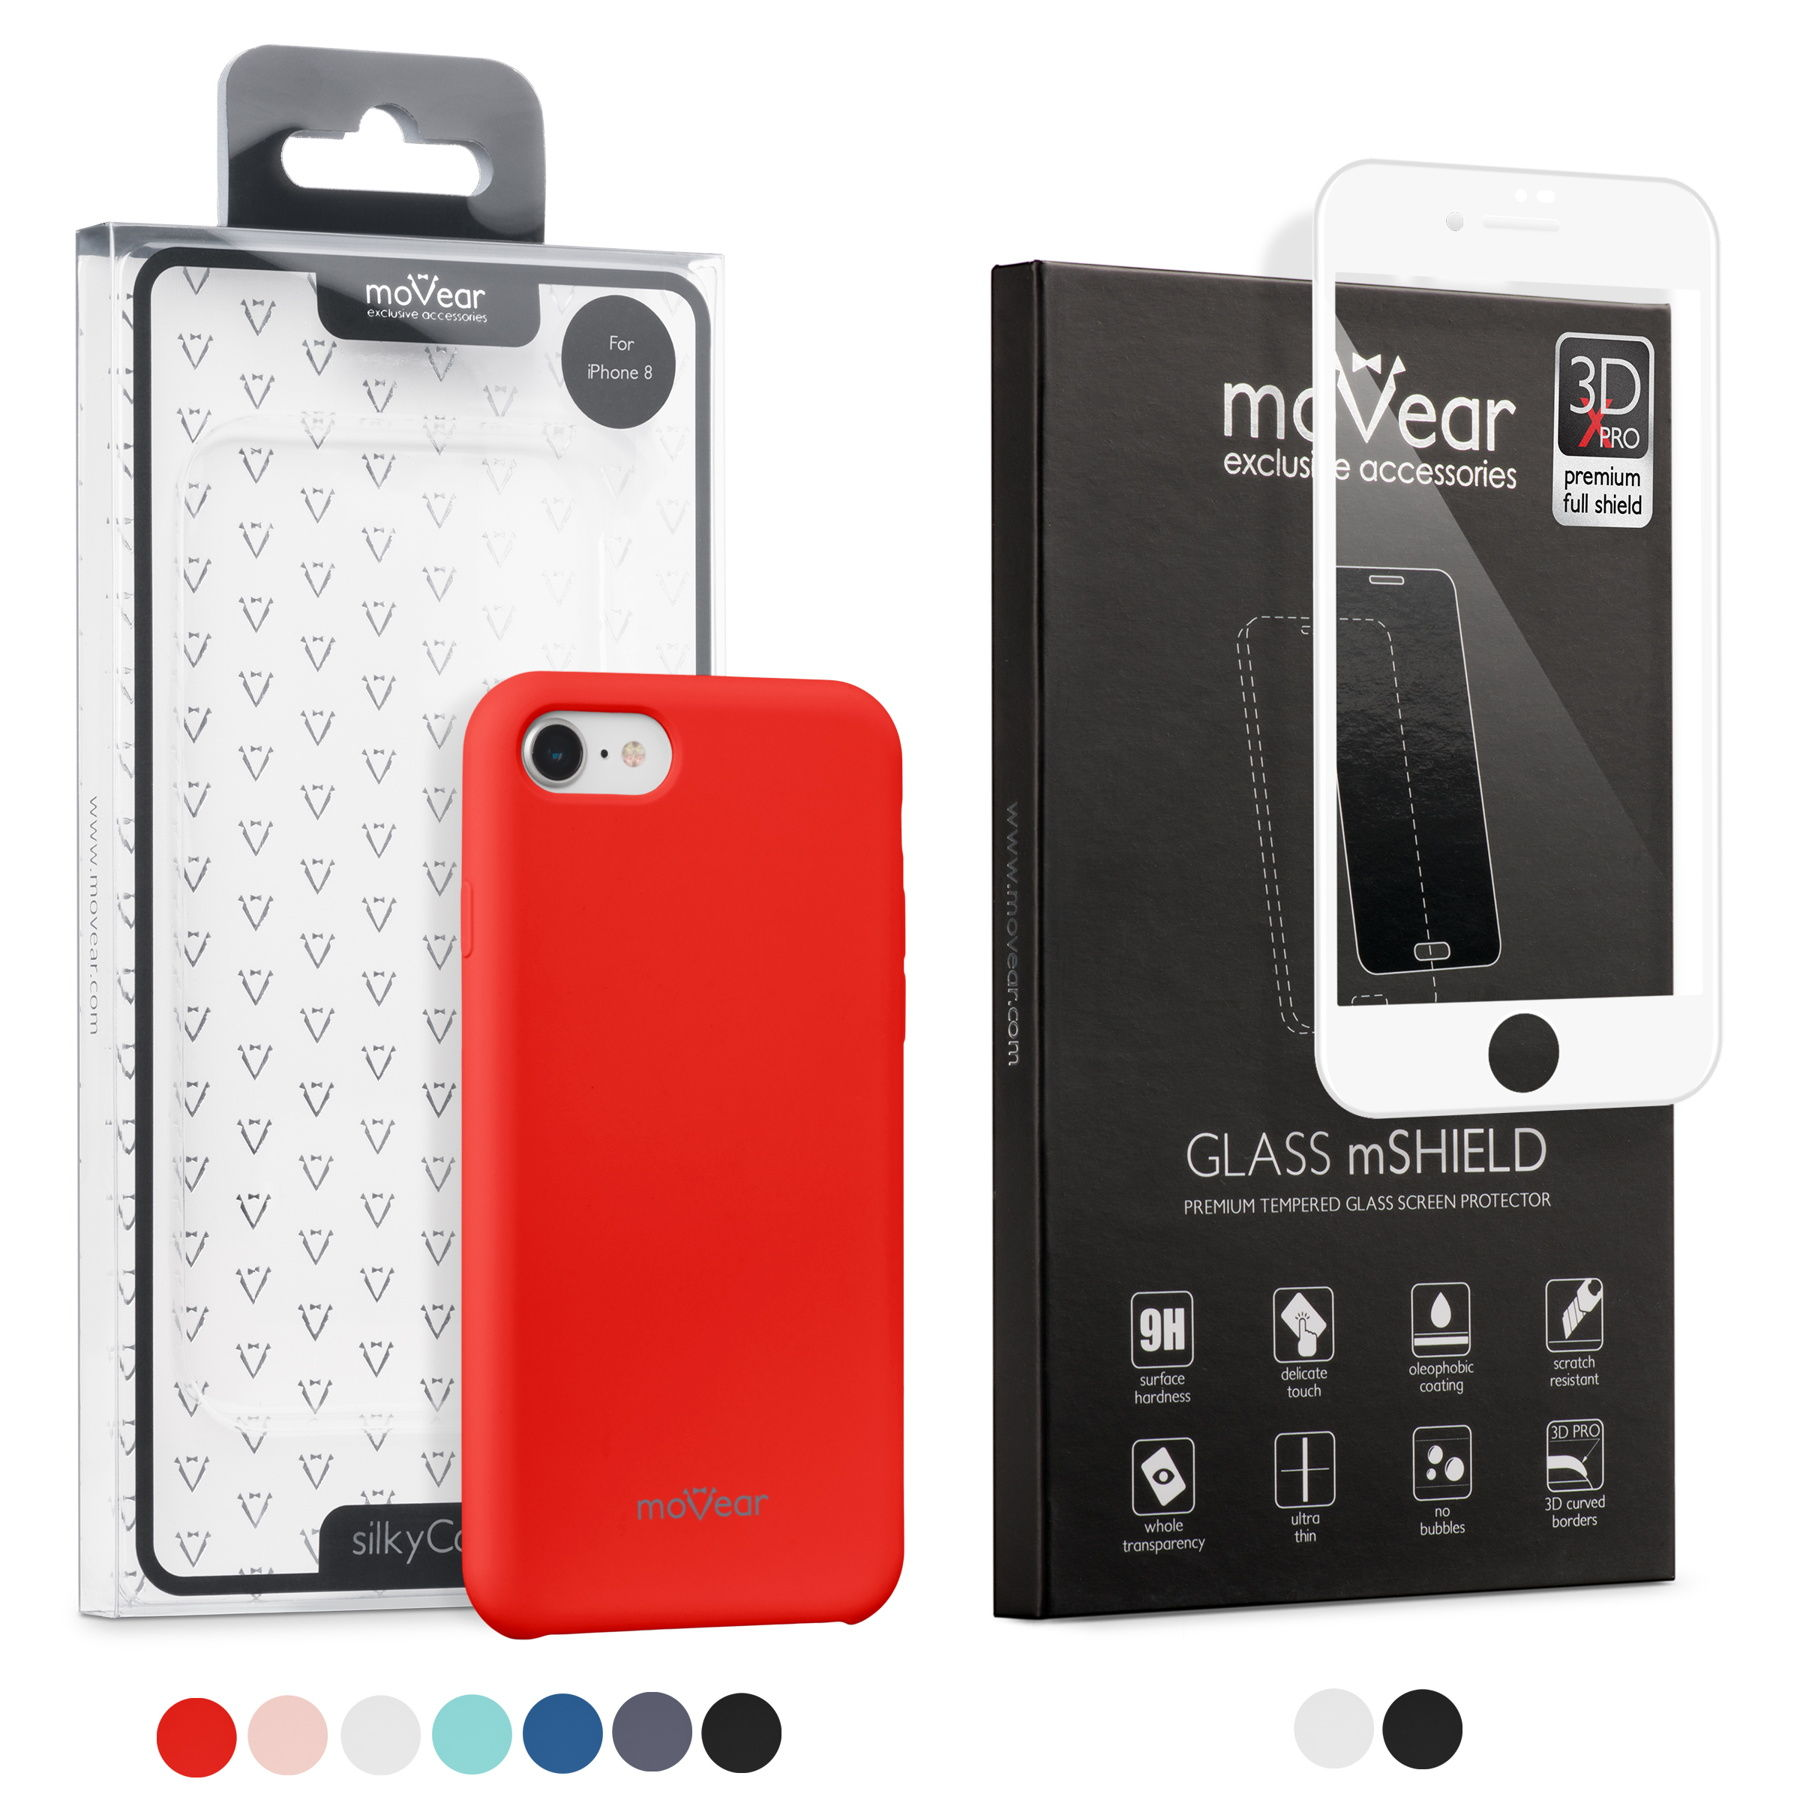 Zestaw moVear etui silkyCase + Szkło Hartowane moVear 3D X-PRO | iPhone 8/7